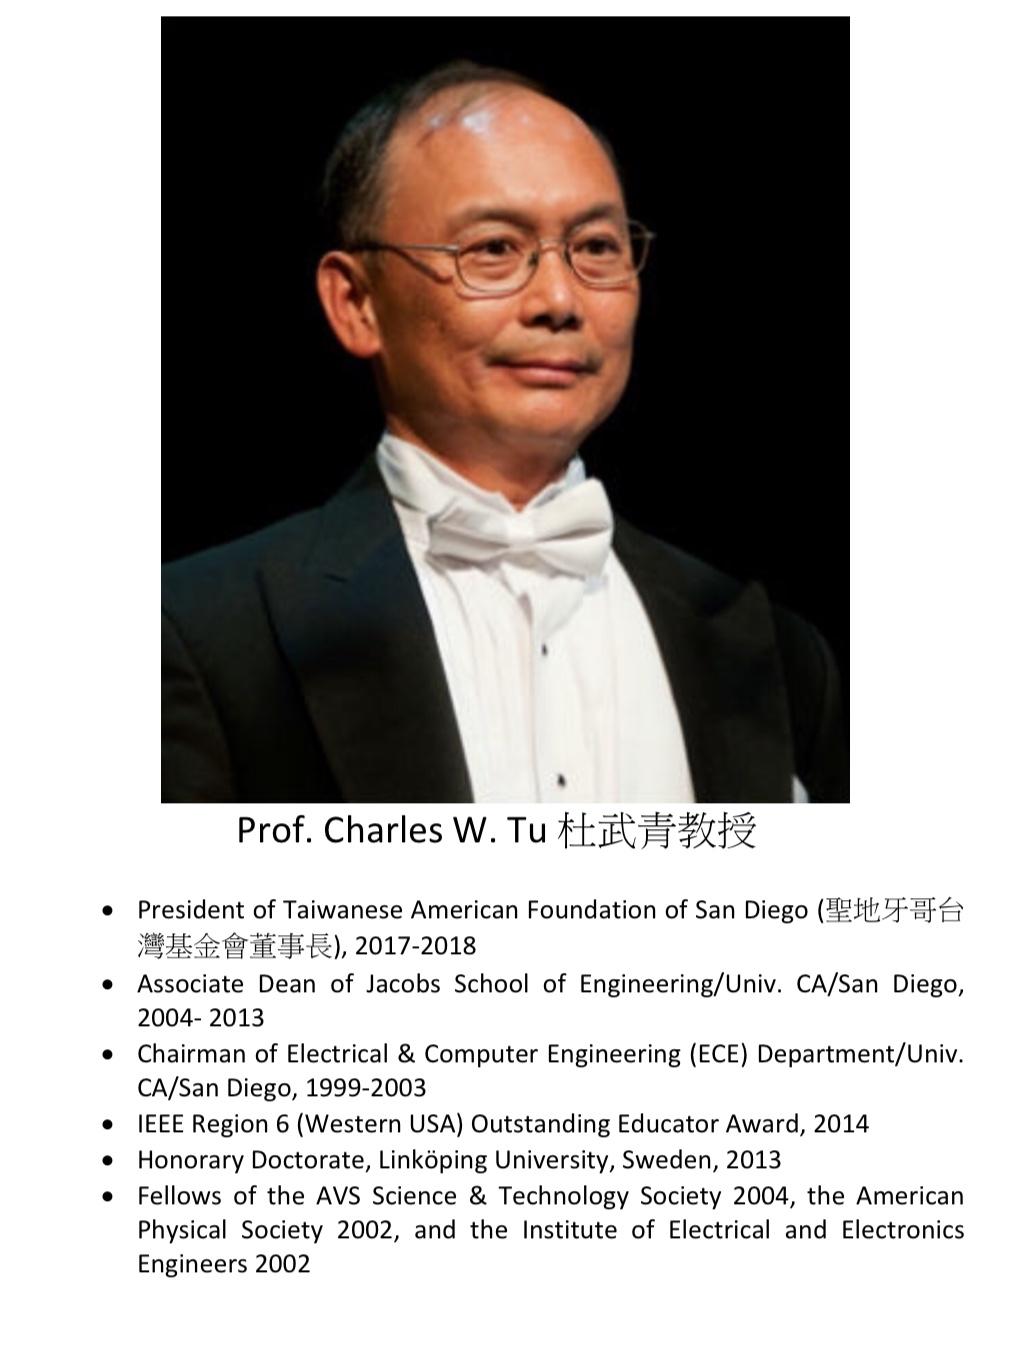 247. Prof. Charles W. Tu 杜武青教授